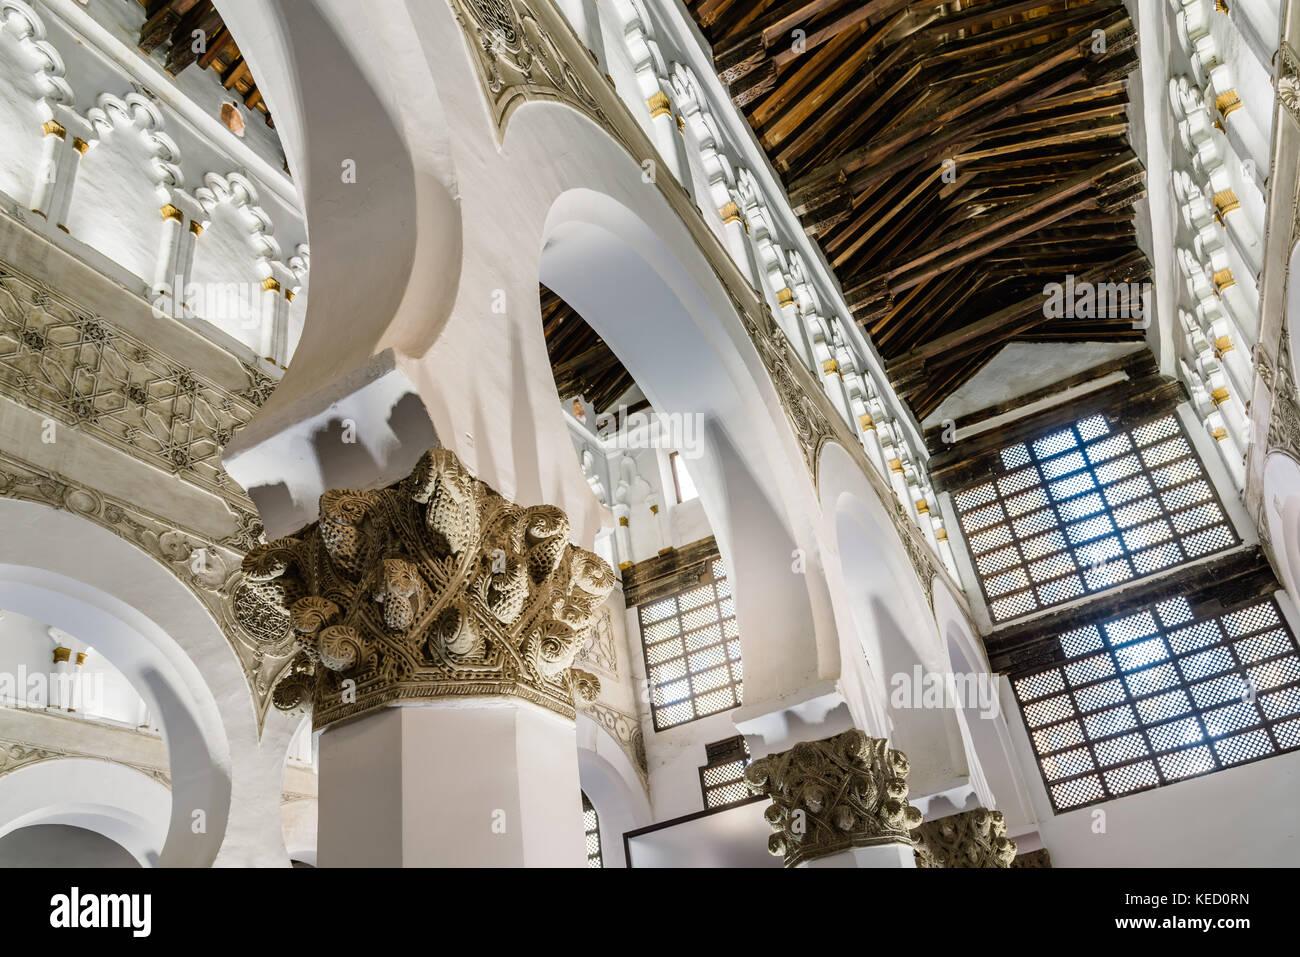 Toledo, Spain - October 13, 2017: Interior view of Santa Maria la Blanca Synagogue. It was constructed under the - Stock Image